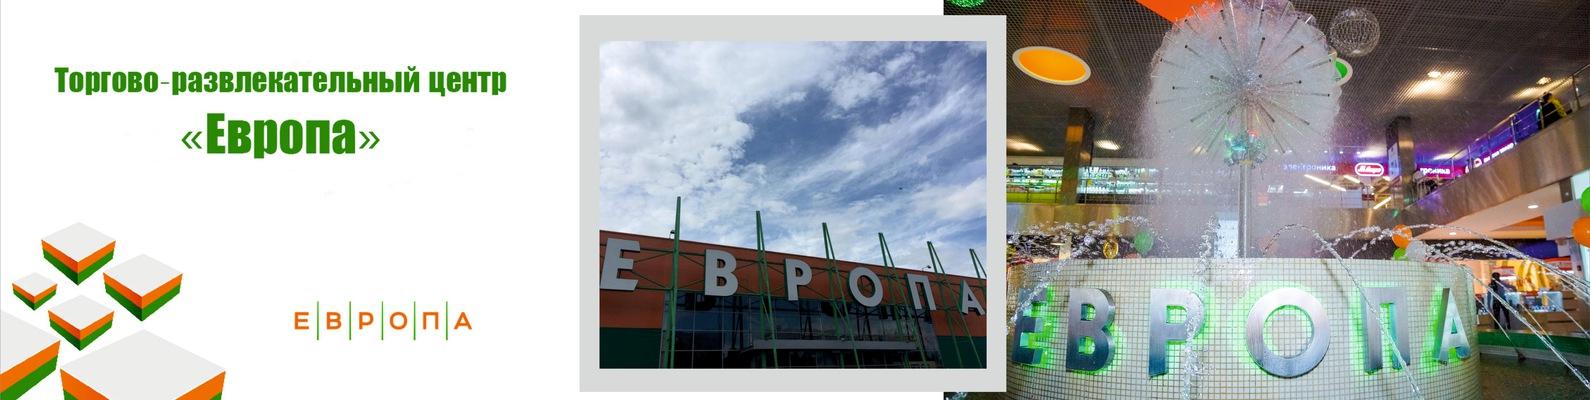 fc801fa08753 ТРЦ Европа г. Барнаул   ВКонтакте